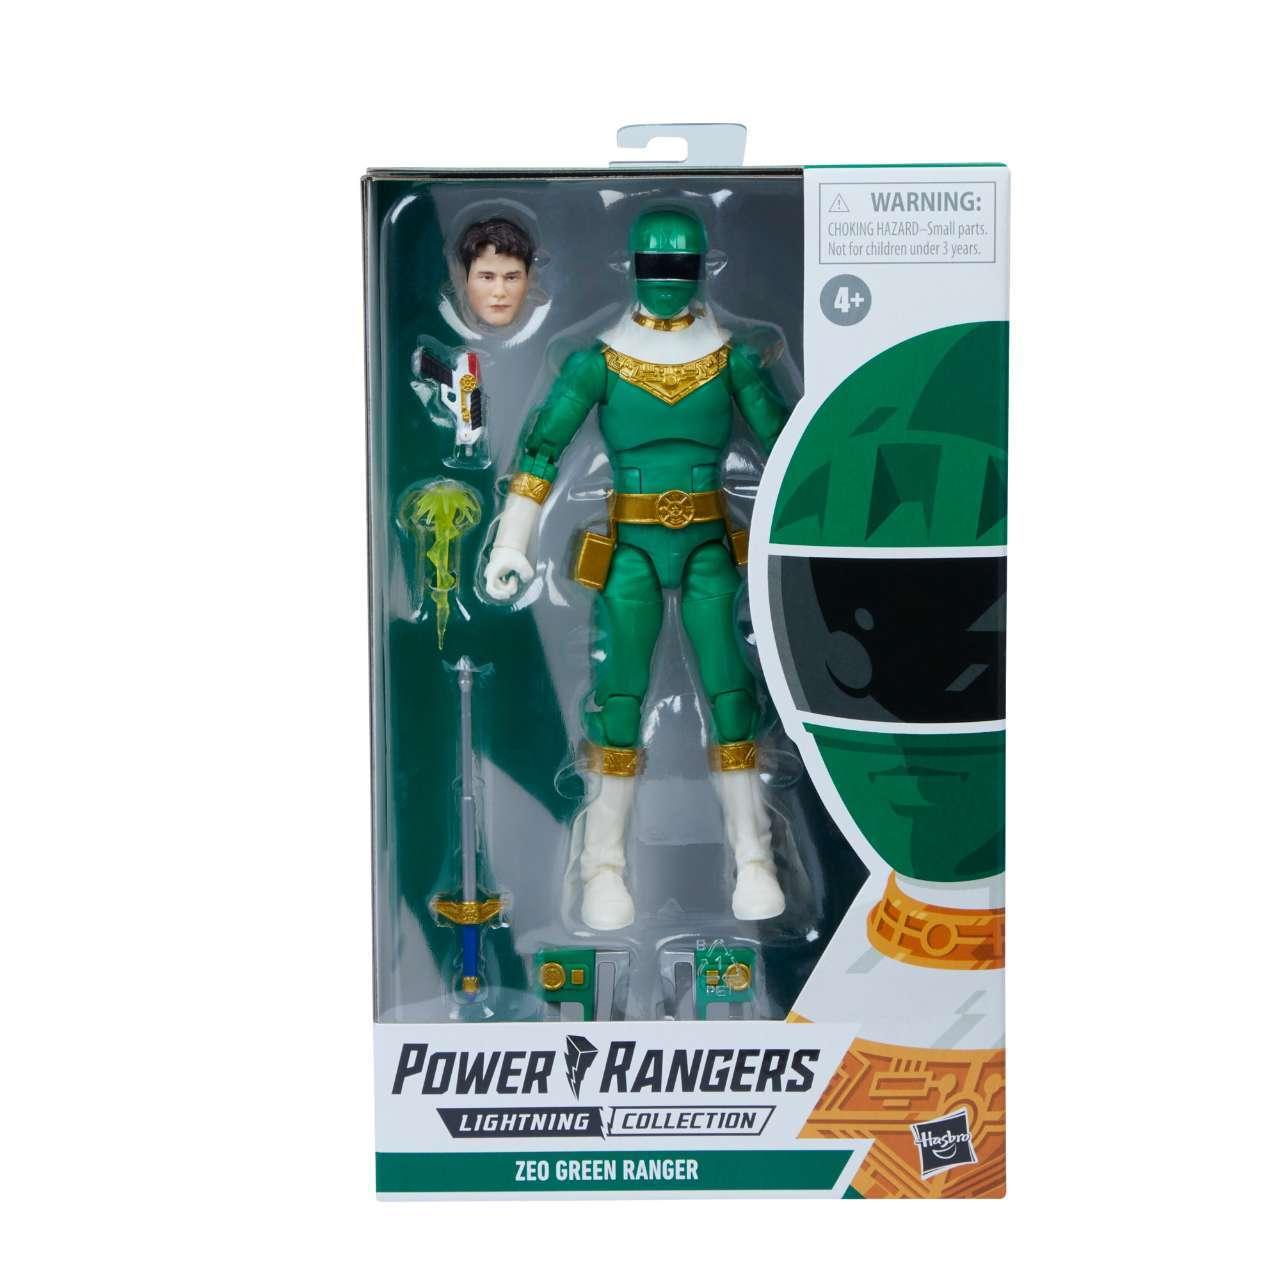 power-rangers-lightning-collection-F1430_PROD_PRG_BLT_ZTH_MERCURY_62A5464_Online_300DPI